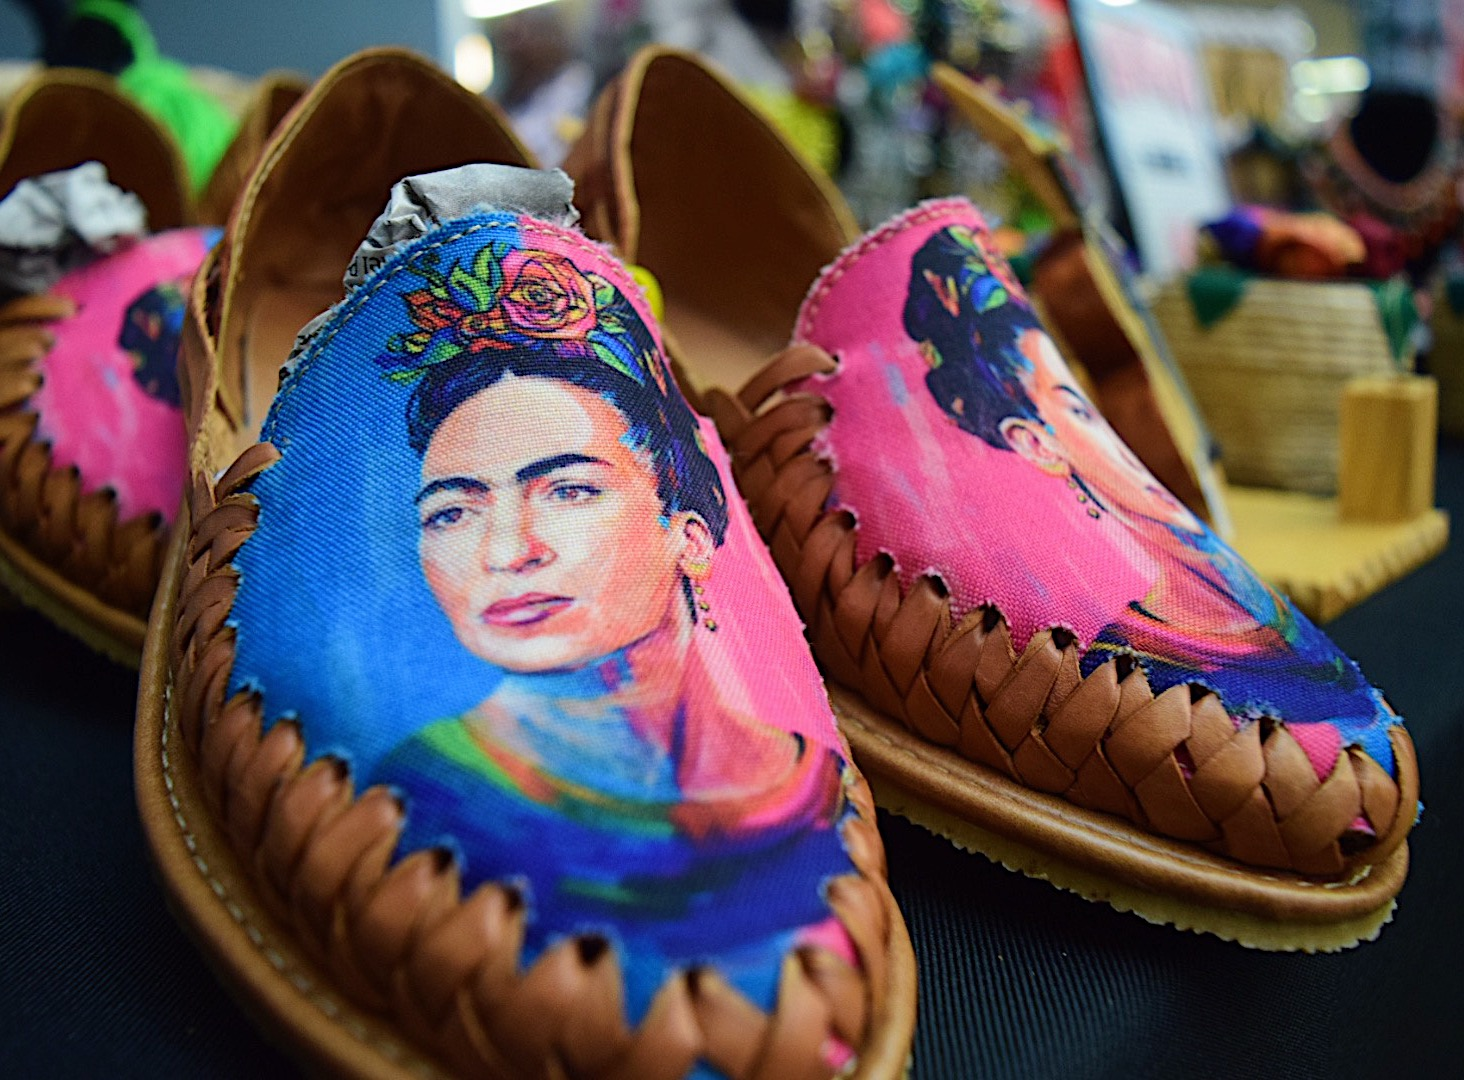 Huaraches%2C+traditional+Hispanic+slip+ons%2C+painted+with+Frida+Kahlo.